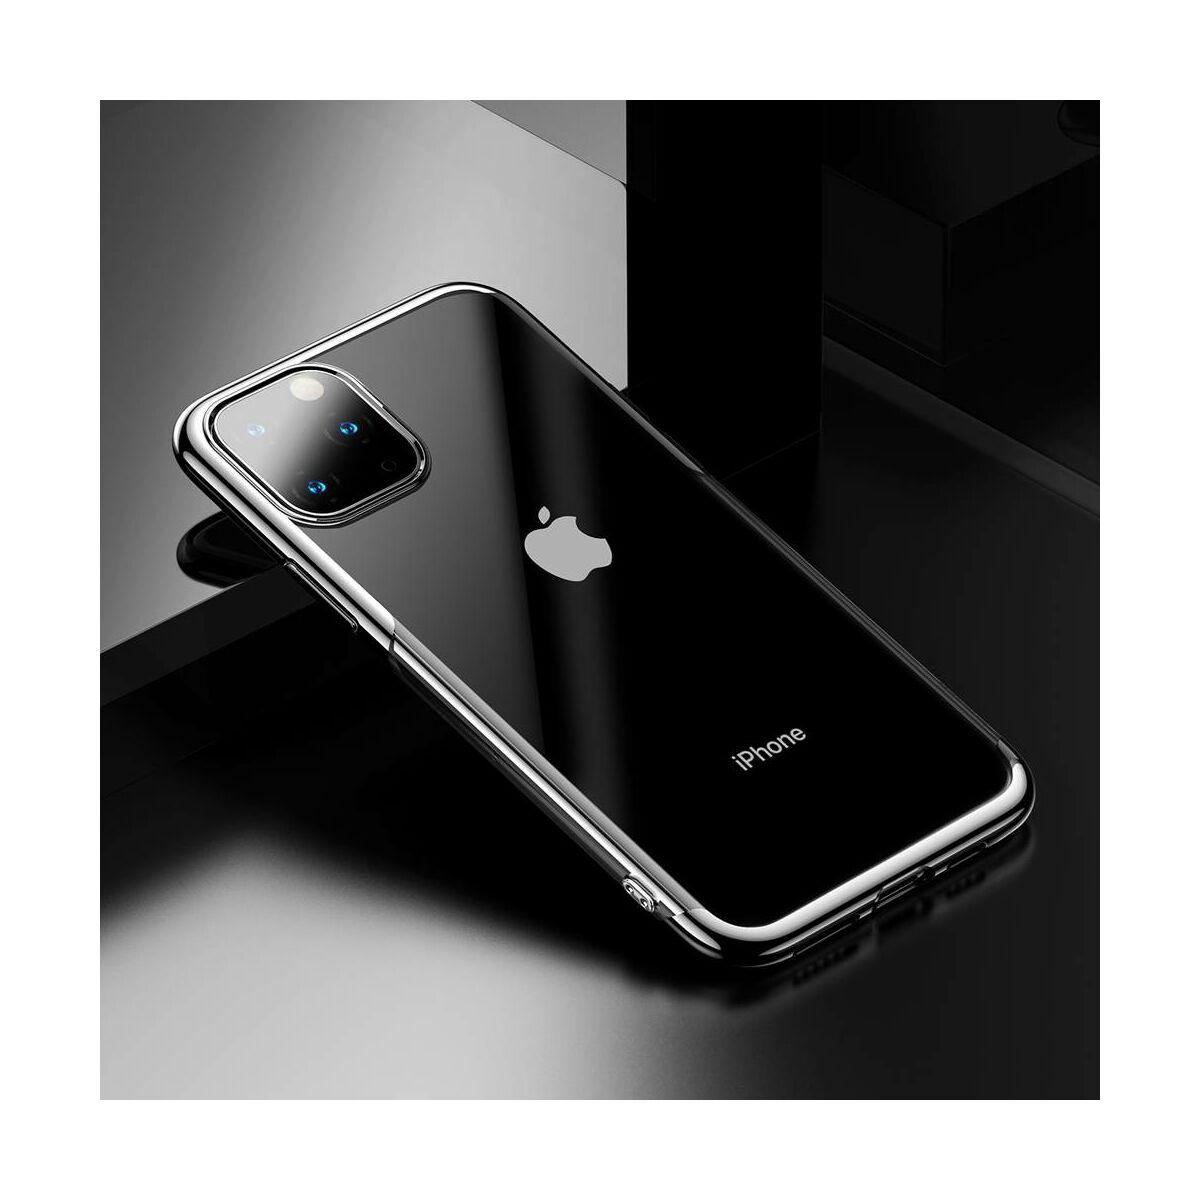 Baseus iPhone 11 Pro Max tok, Shining, ezüst (ARAPIPH65S-MD0S)